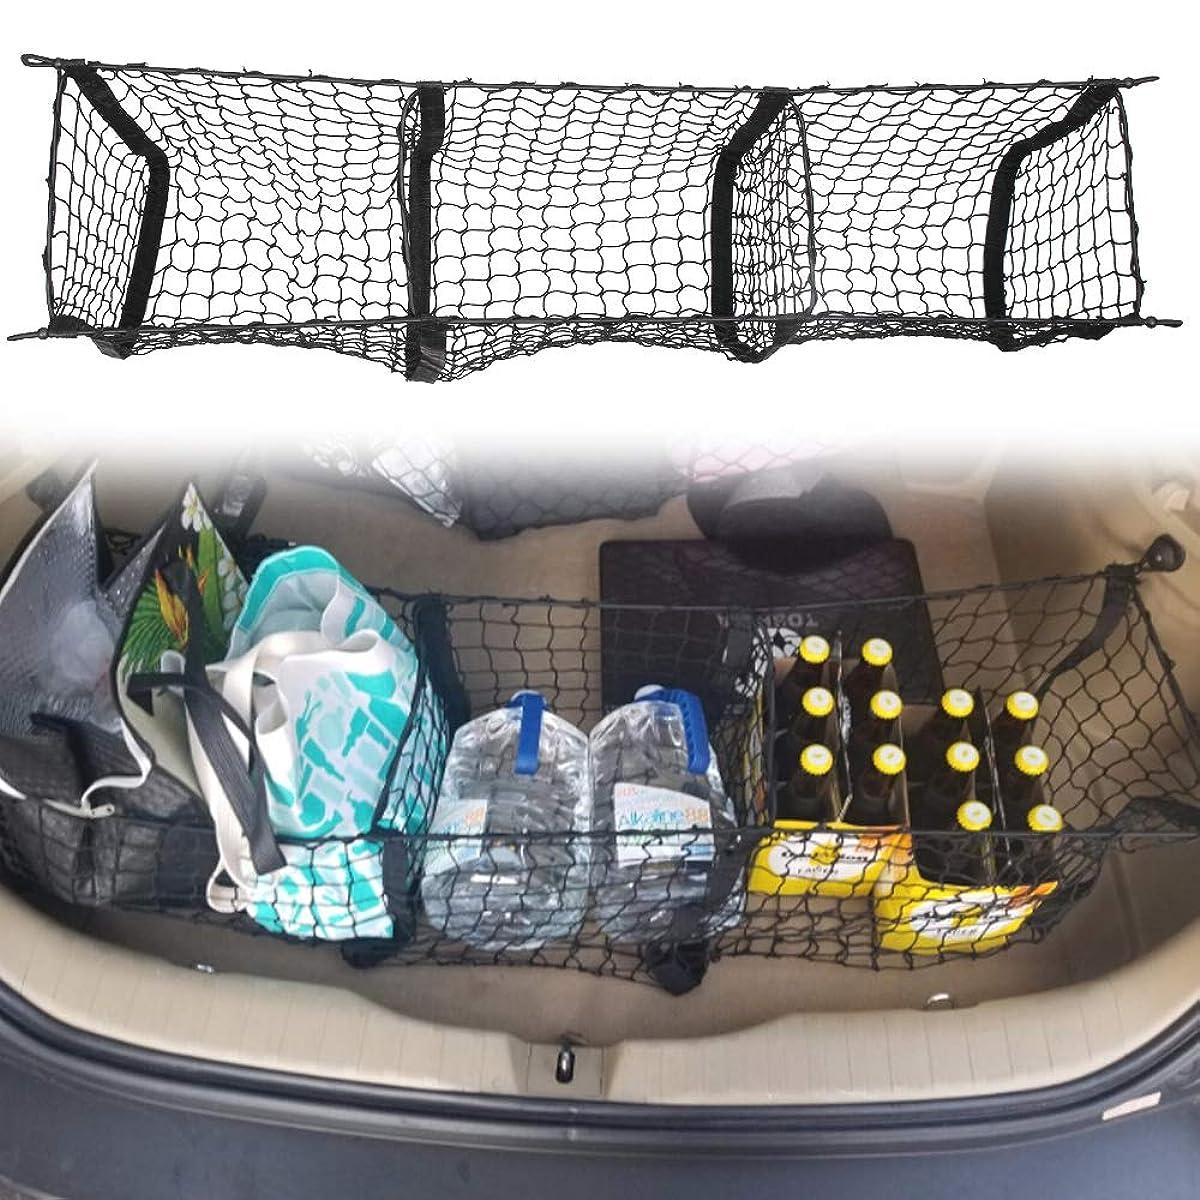 Three Pocket Envelope Cargo Net Fit for Mazda CX-9 2015 2016 2017 2018 Cargo Organizer Storage Net